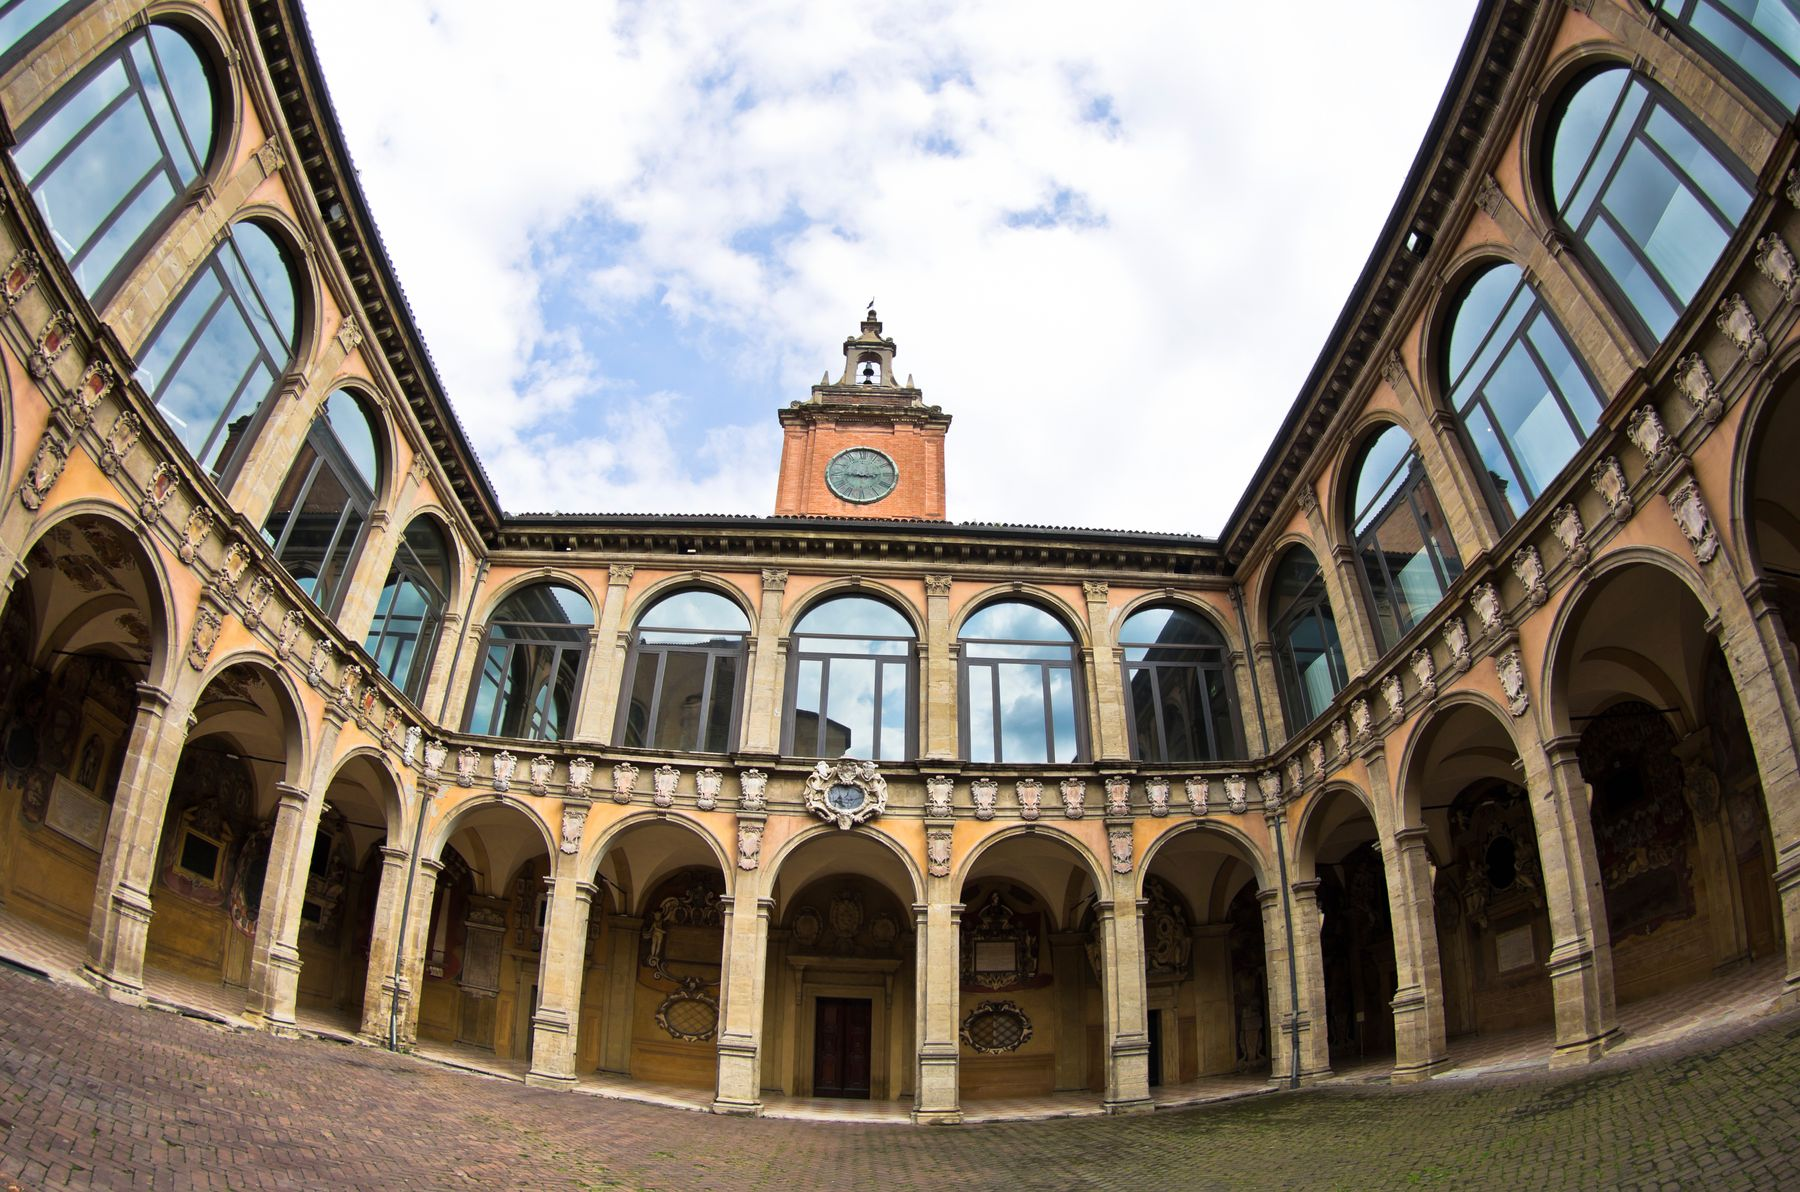 Архигимназия — старейший корпус Болонского университета.